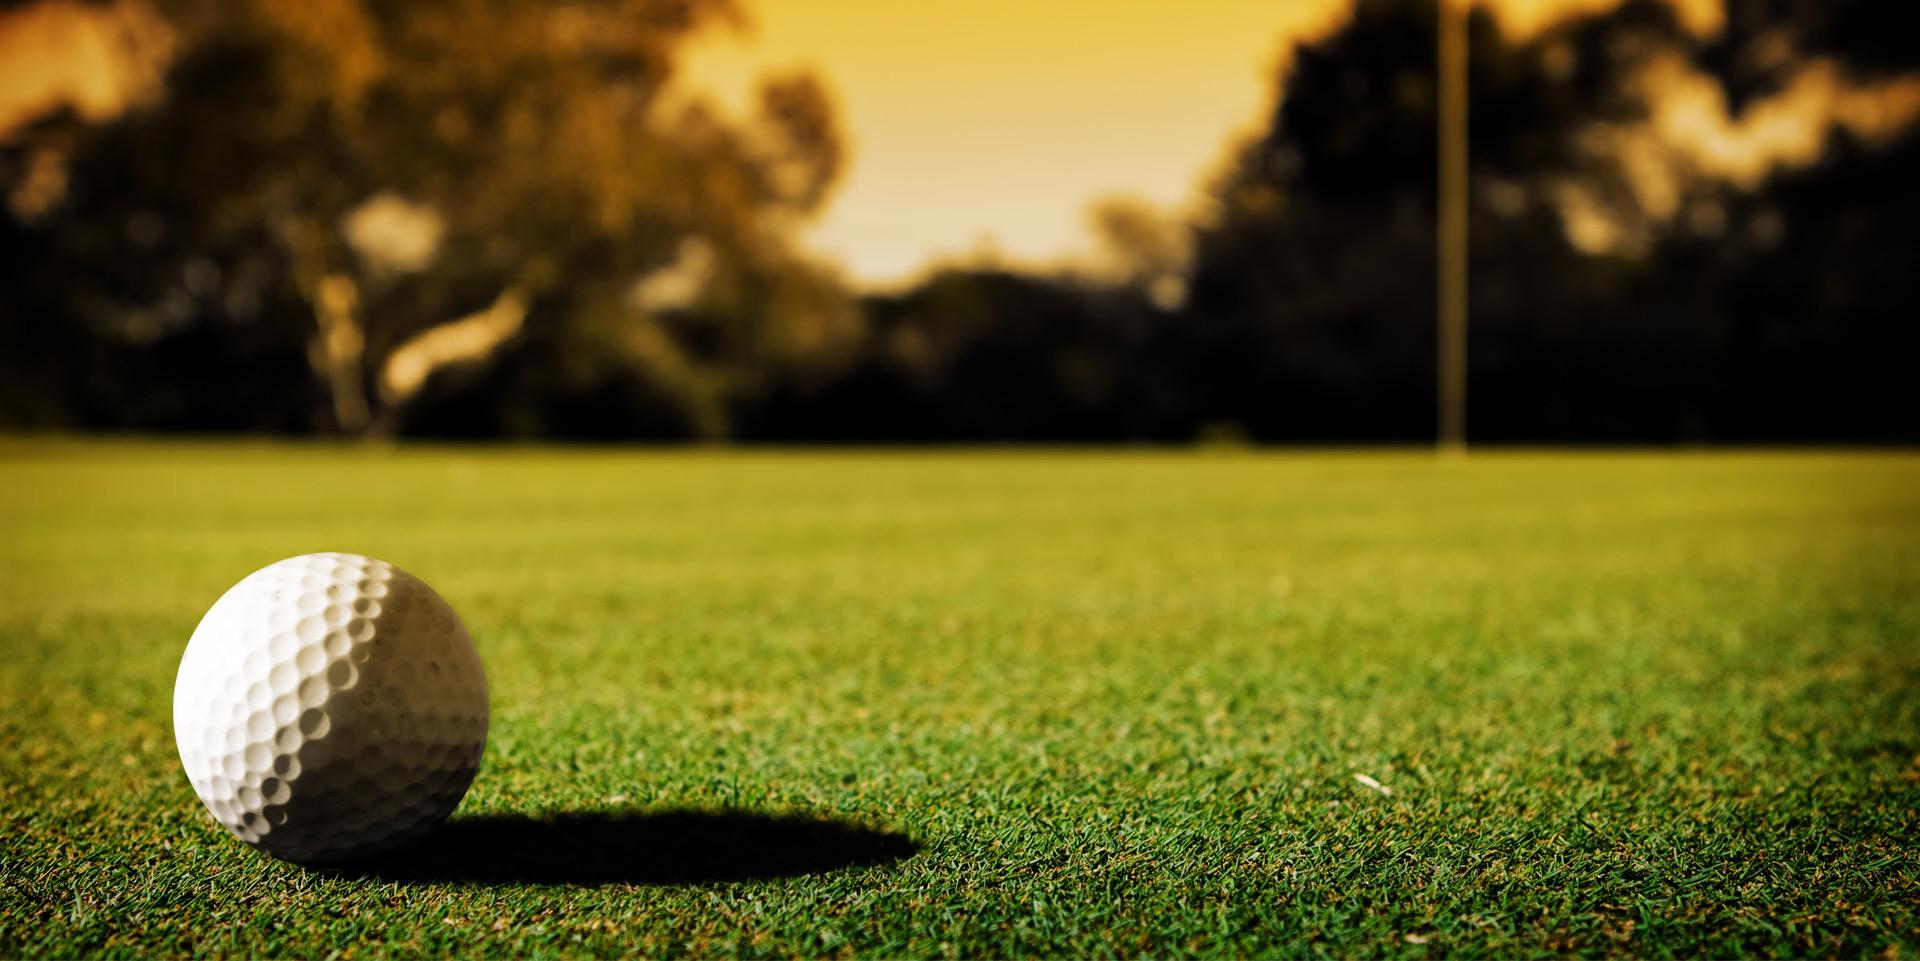 Awesome 2015 Charity Golf Day – Make A Wish Australia